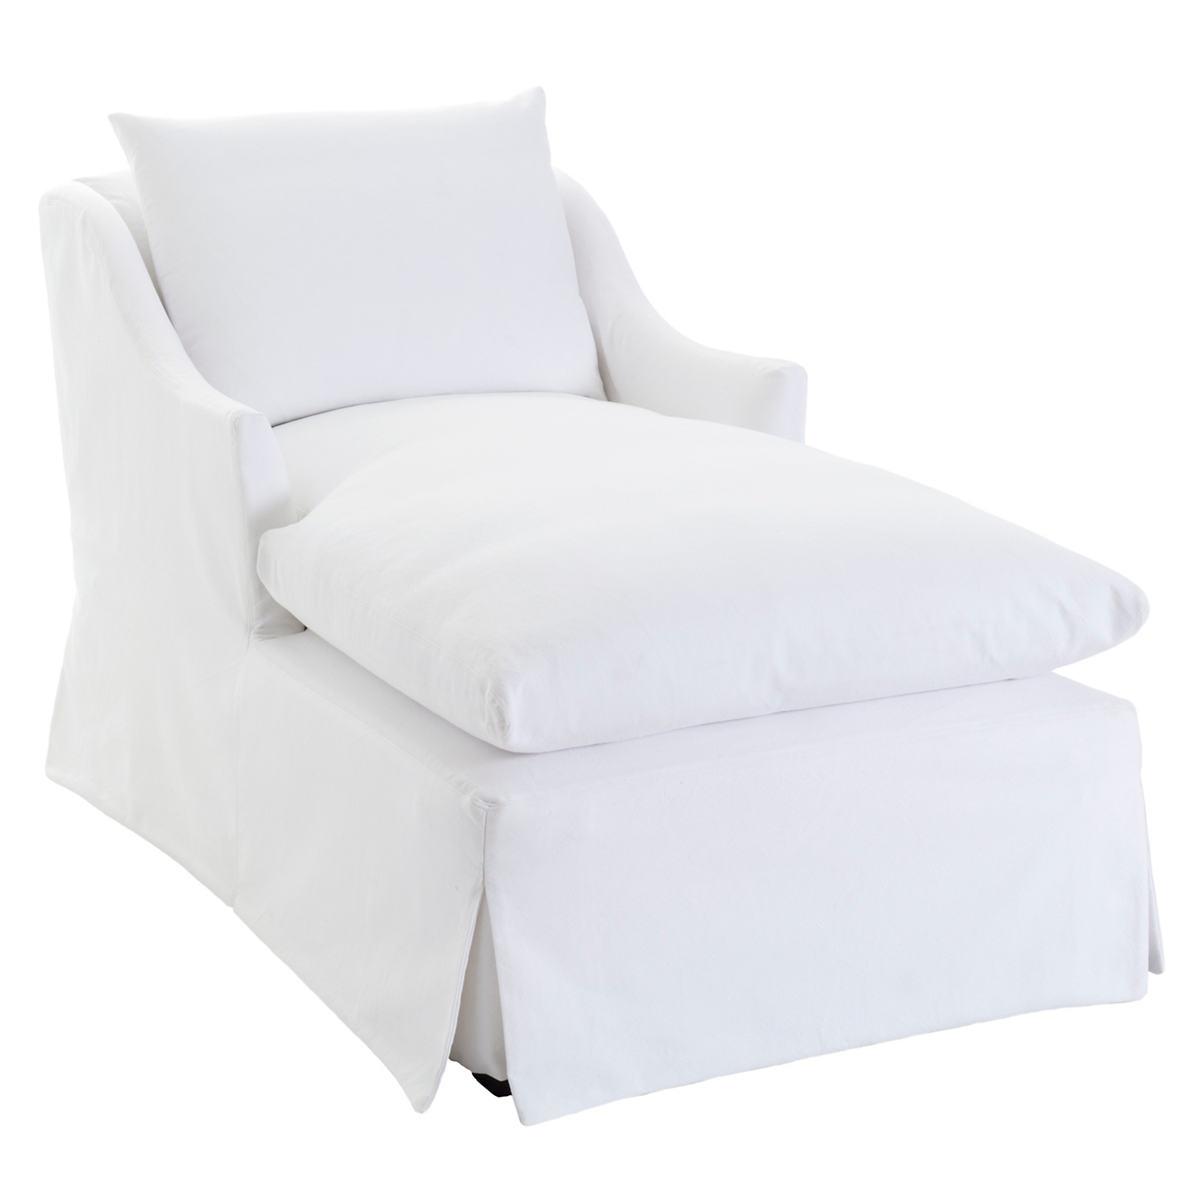 Namaste White Slipcovered Chaise